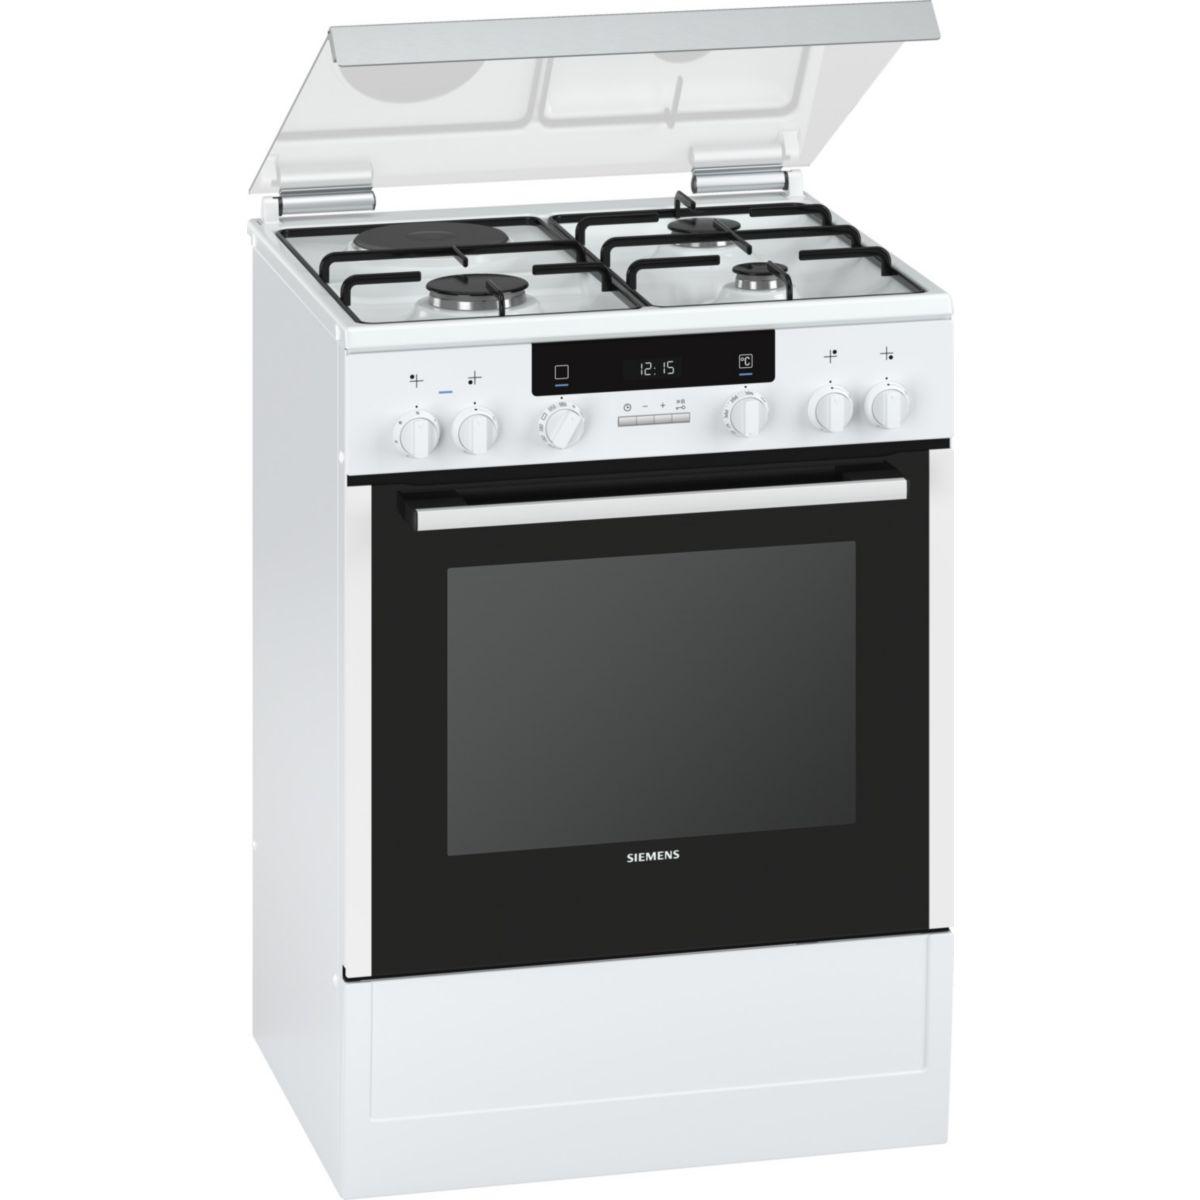 Cuisinière mixte SIEMENS HX85D220F